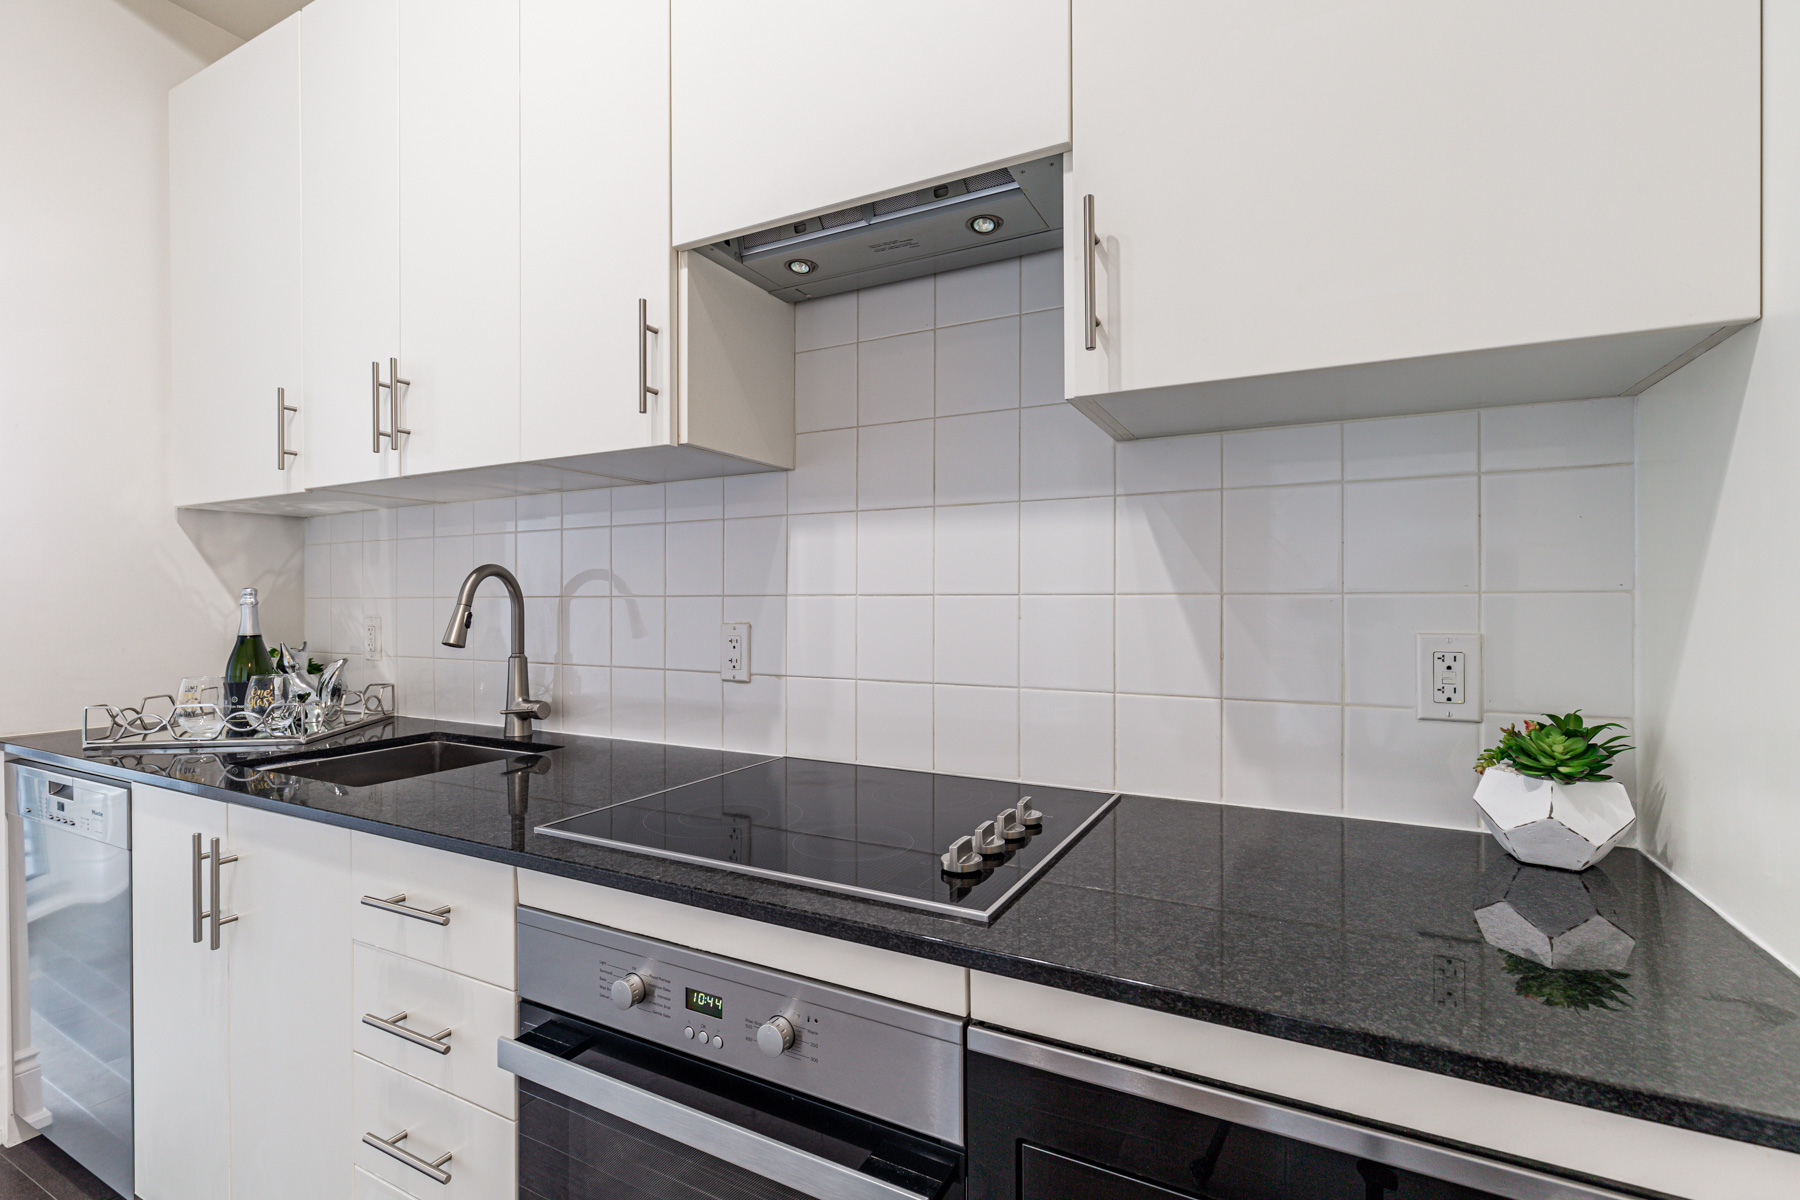 23 Glebe Rd W condo kitchen with white cabinets, black granite counters and white ceramic backsplash.